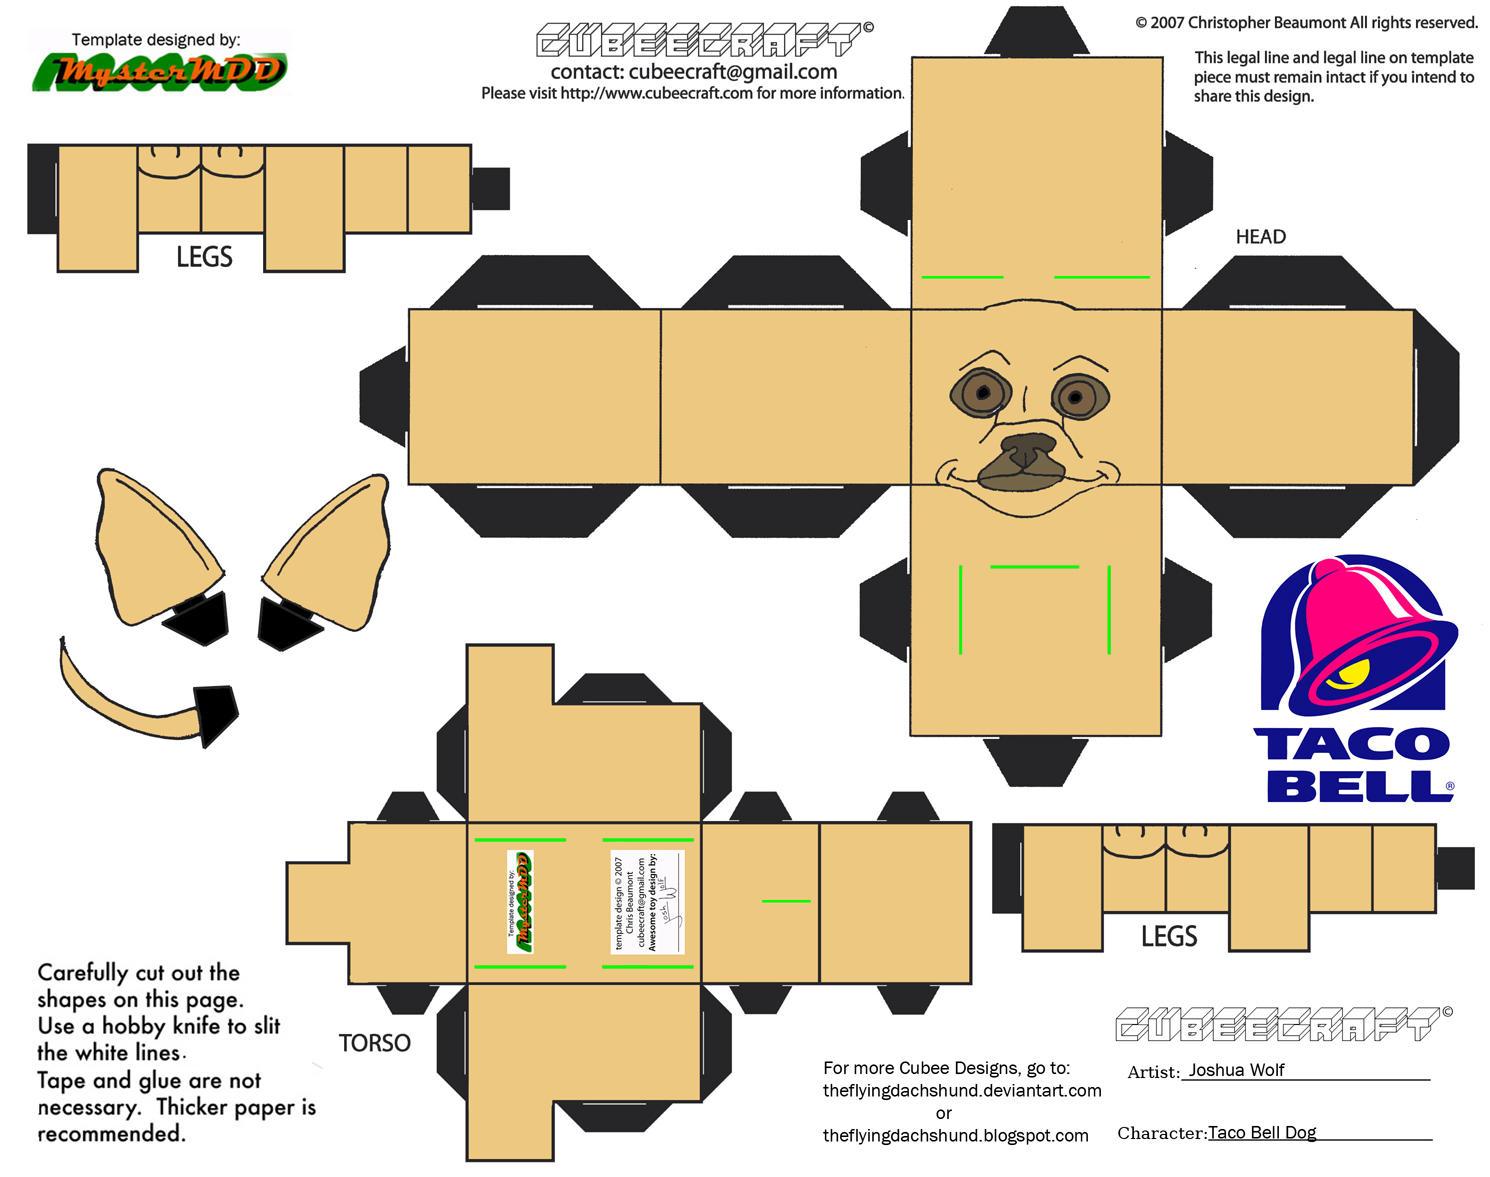 ADV CH19: Taco Bell Dog Cubee by TheFlyingDachshund on DeviantArt